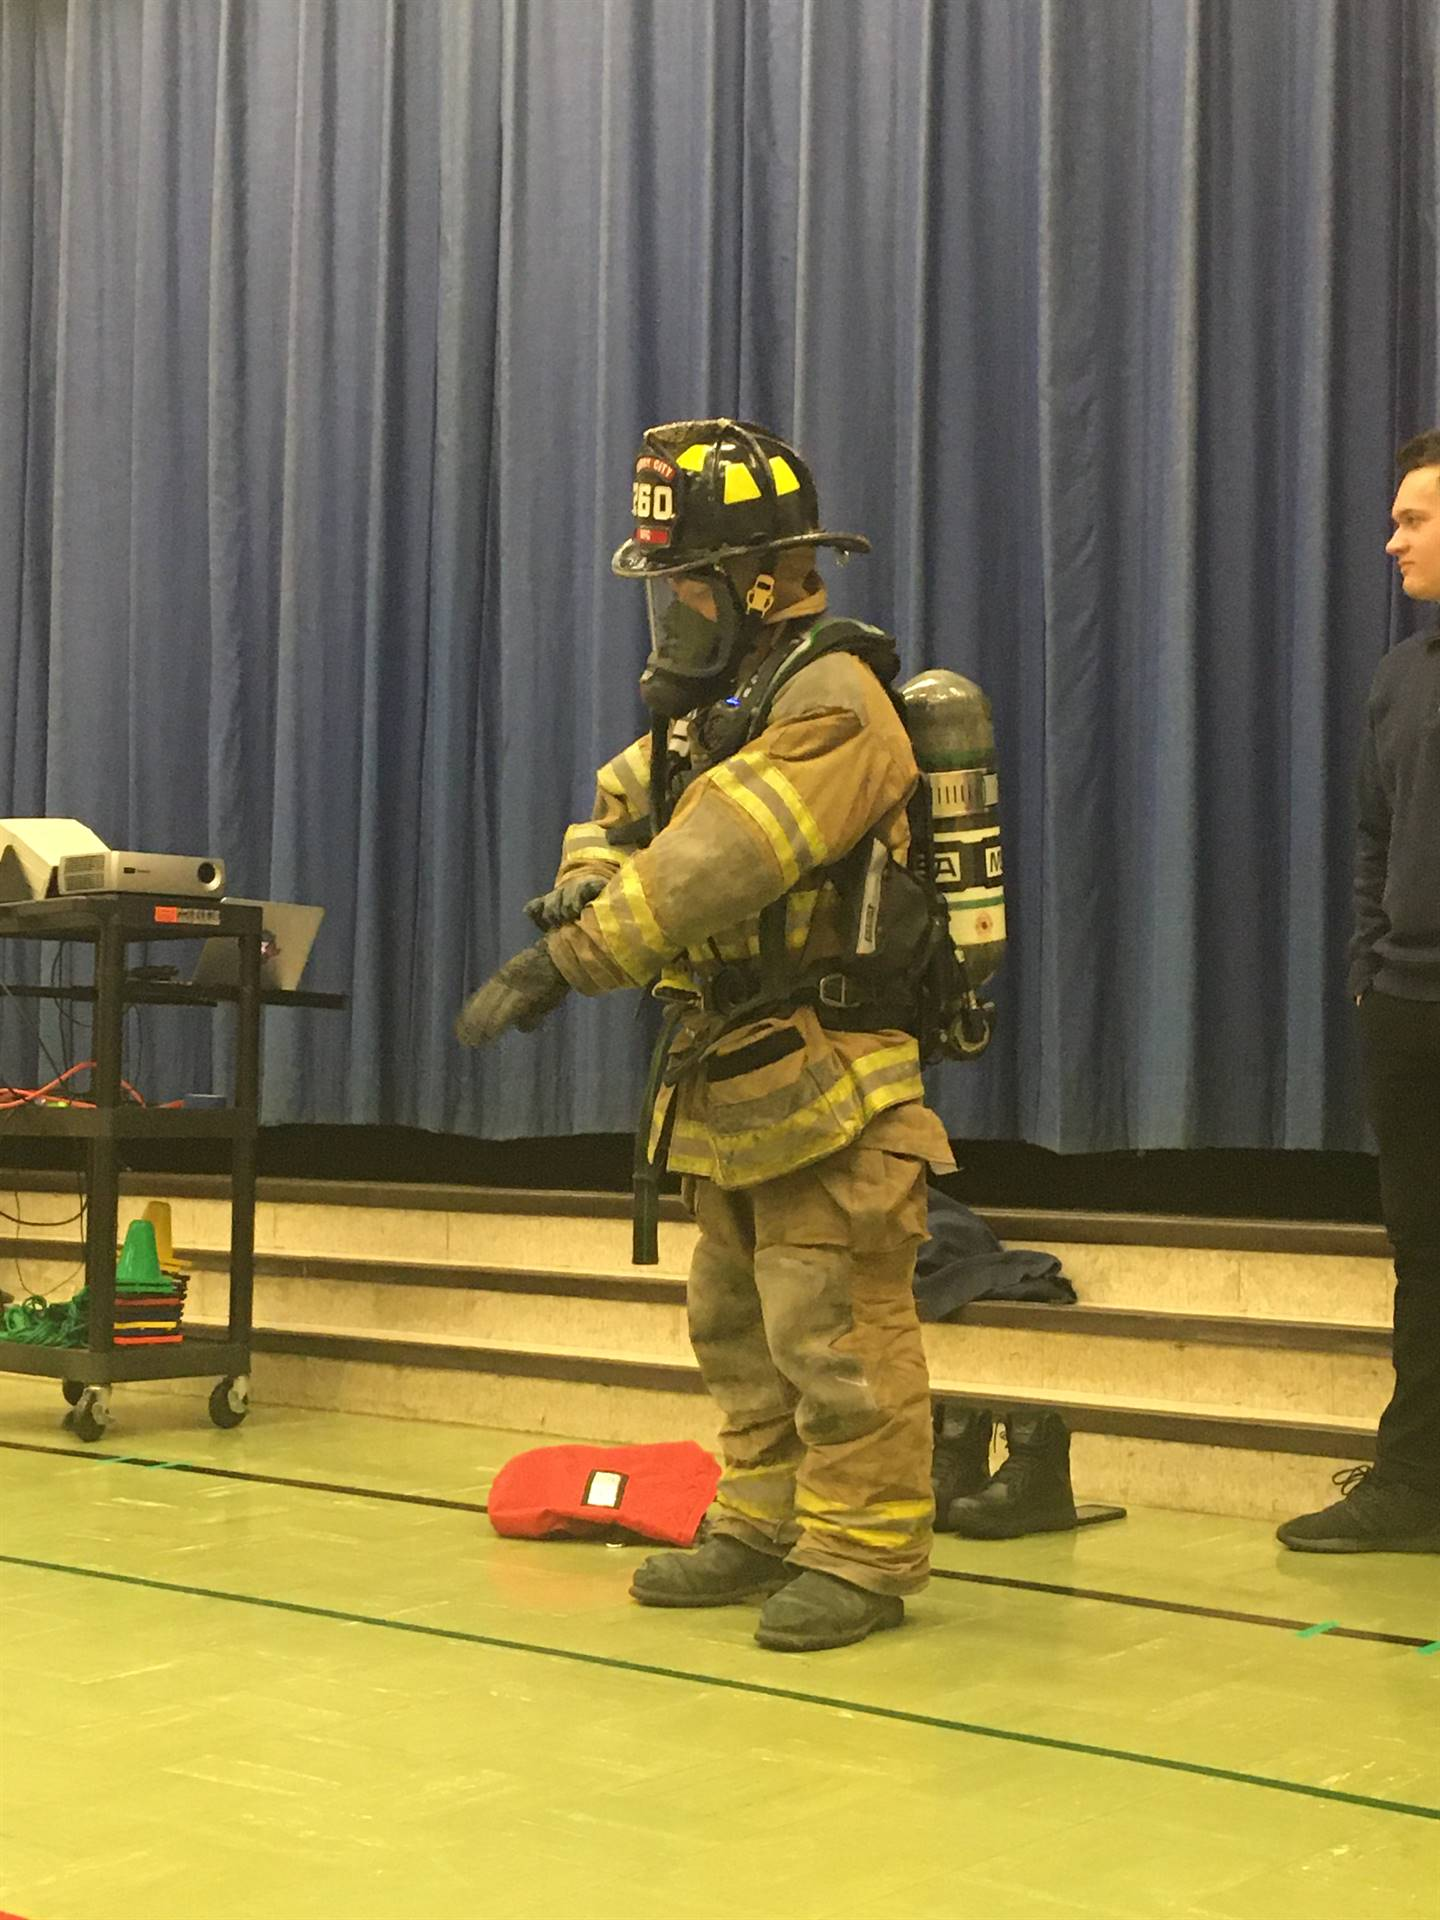 Firefighter puts on fire gear